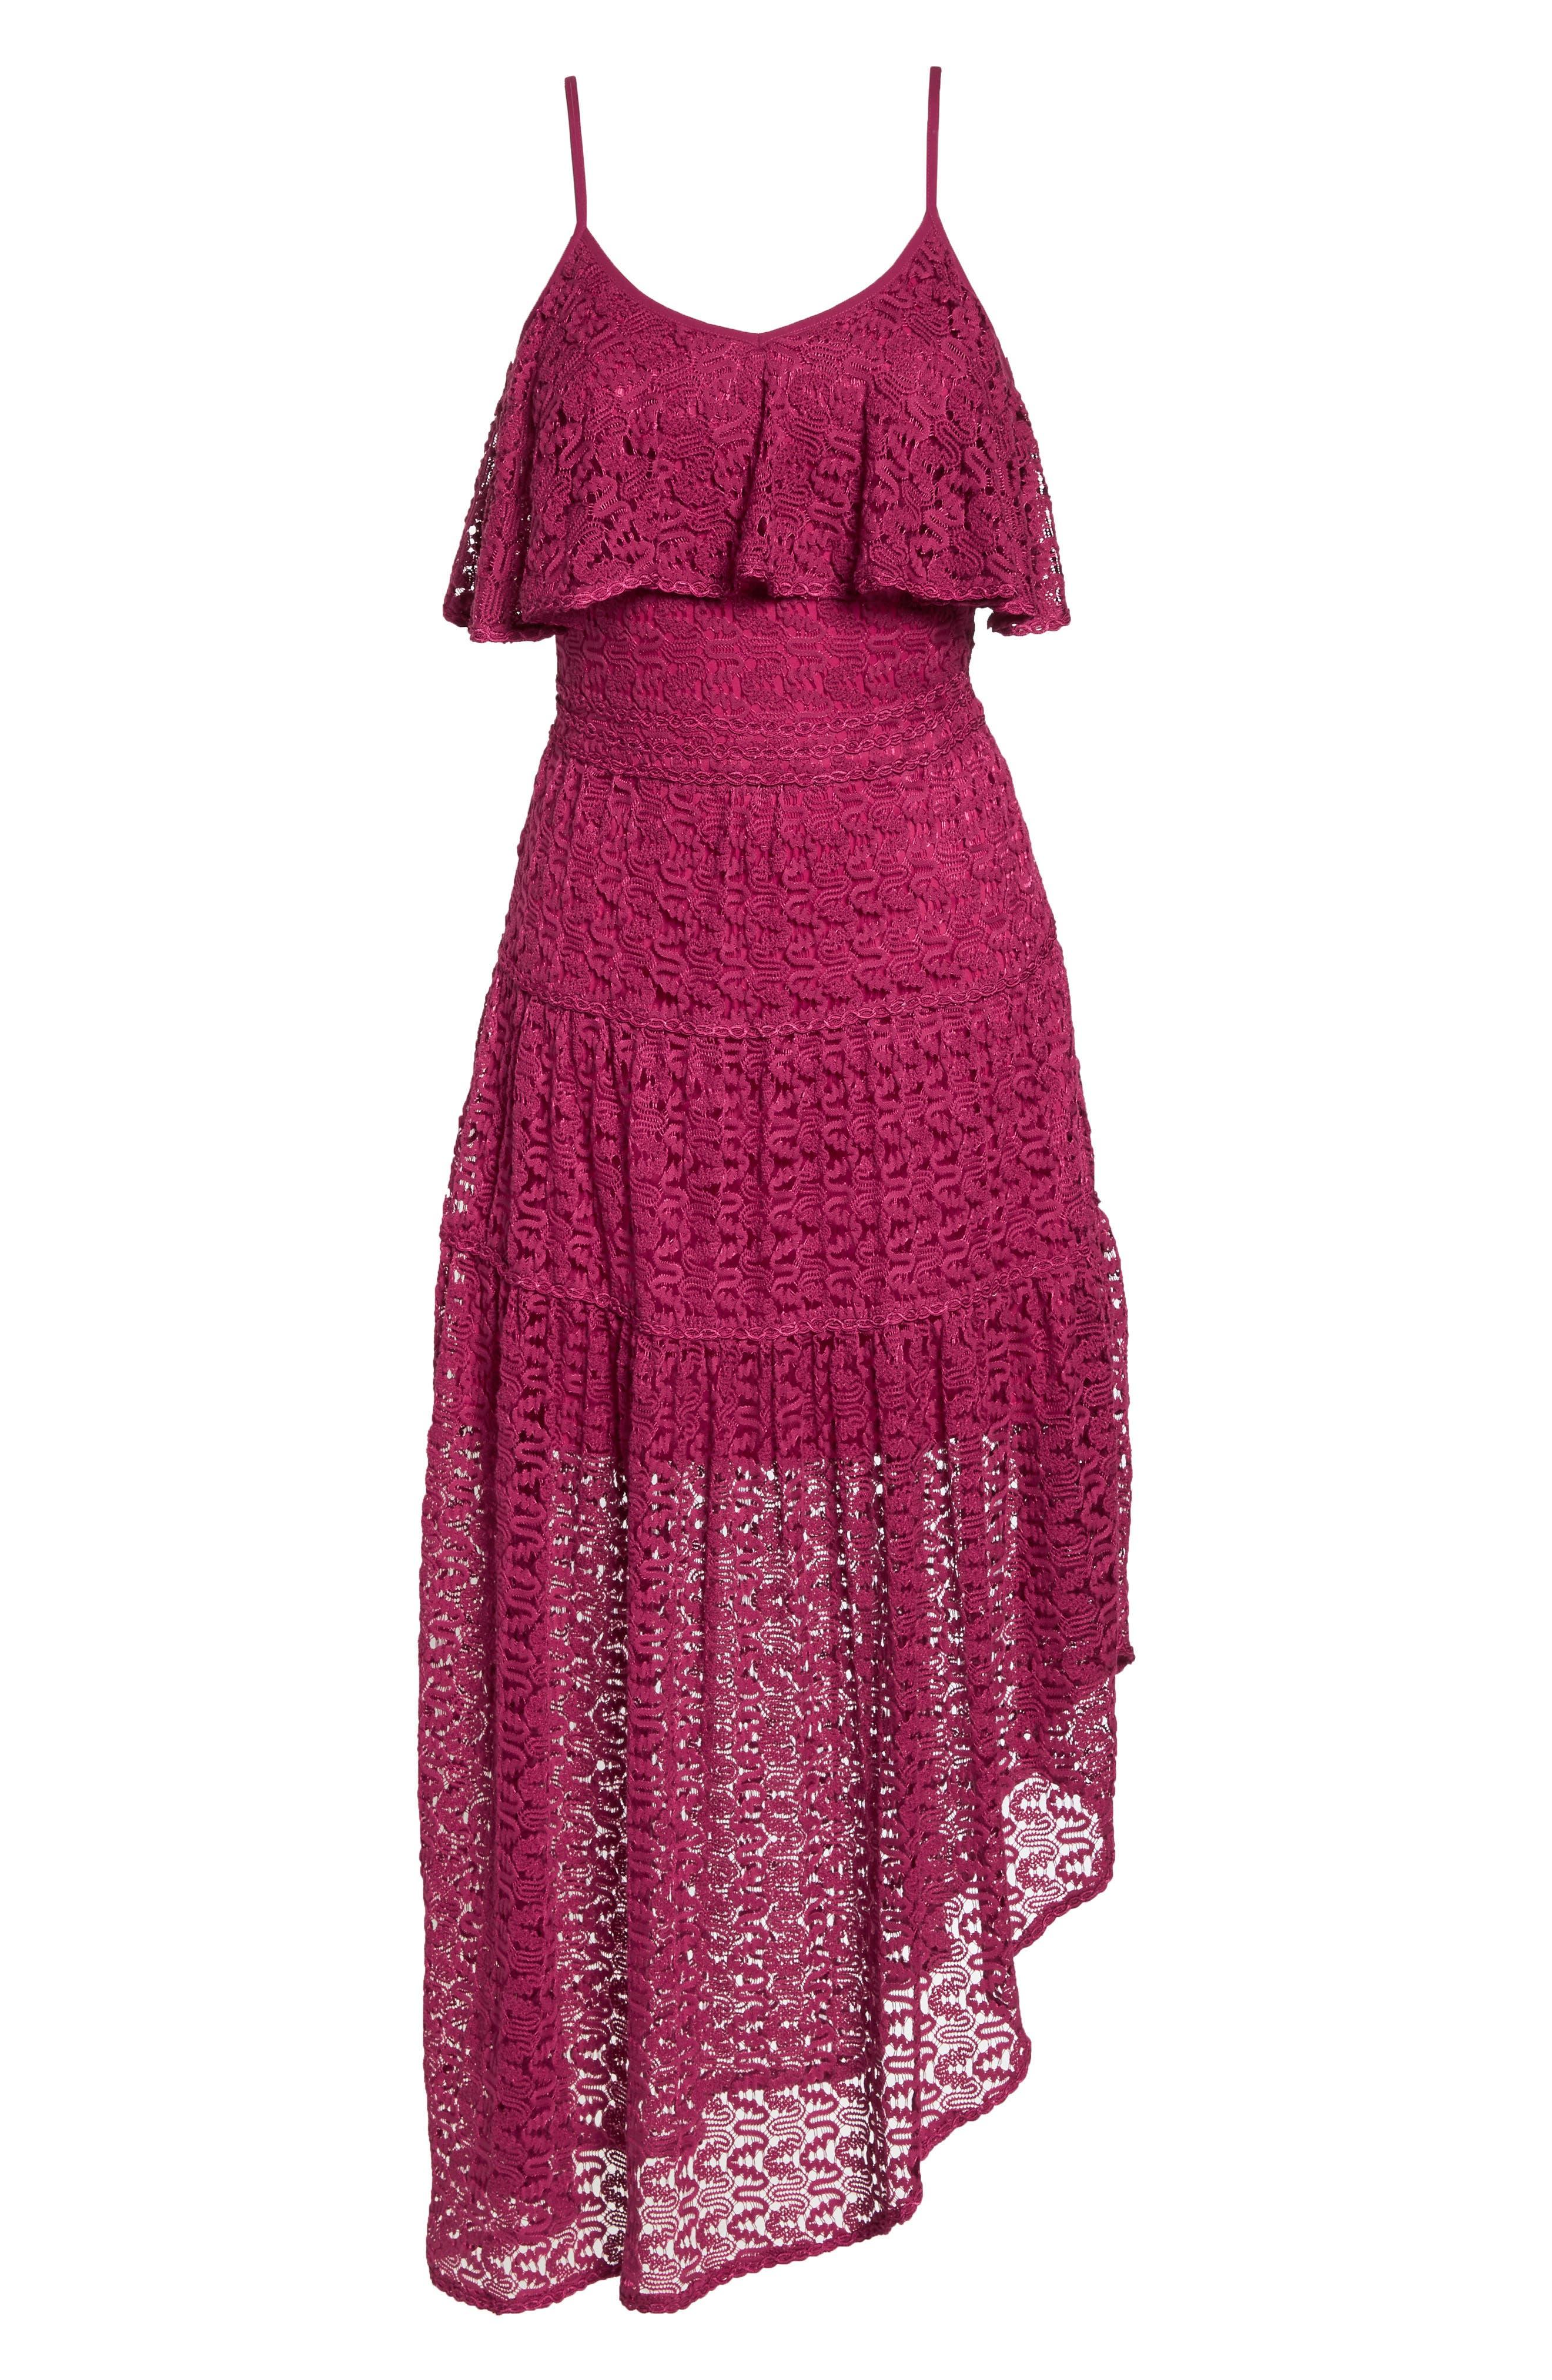 Rayna Asymmetrical Lace Dress,                             Alternate thumbnail 7, color,                             939